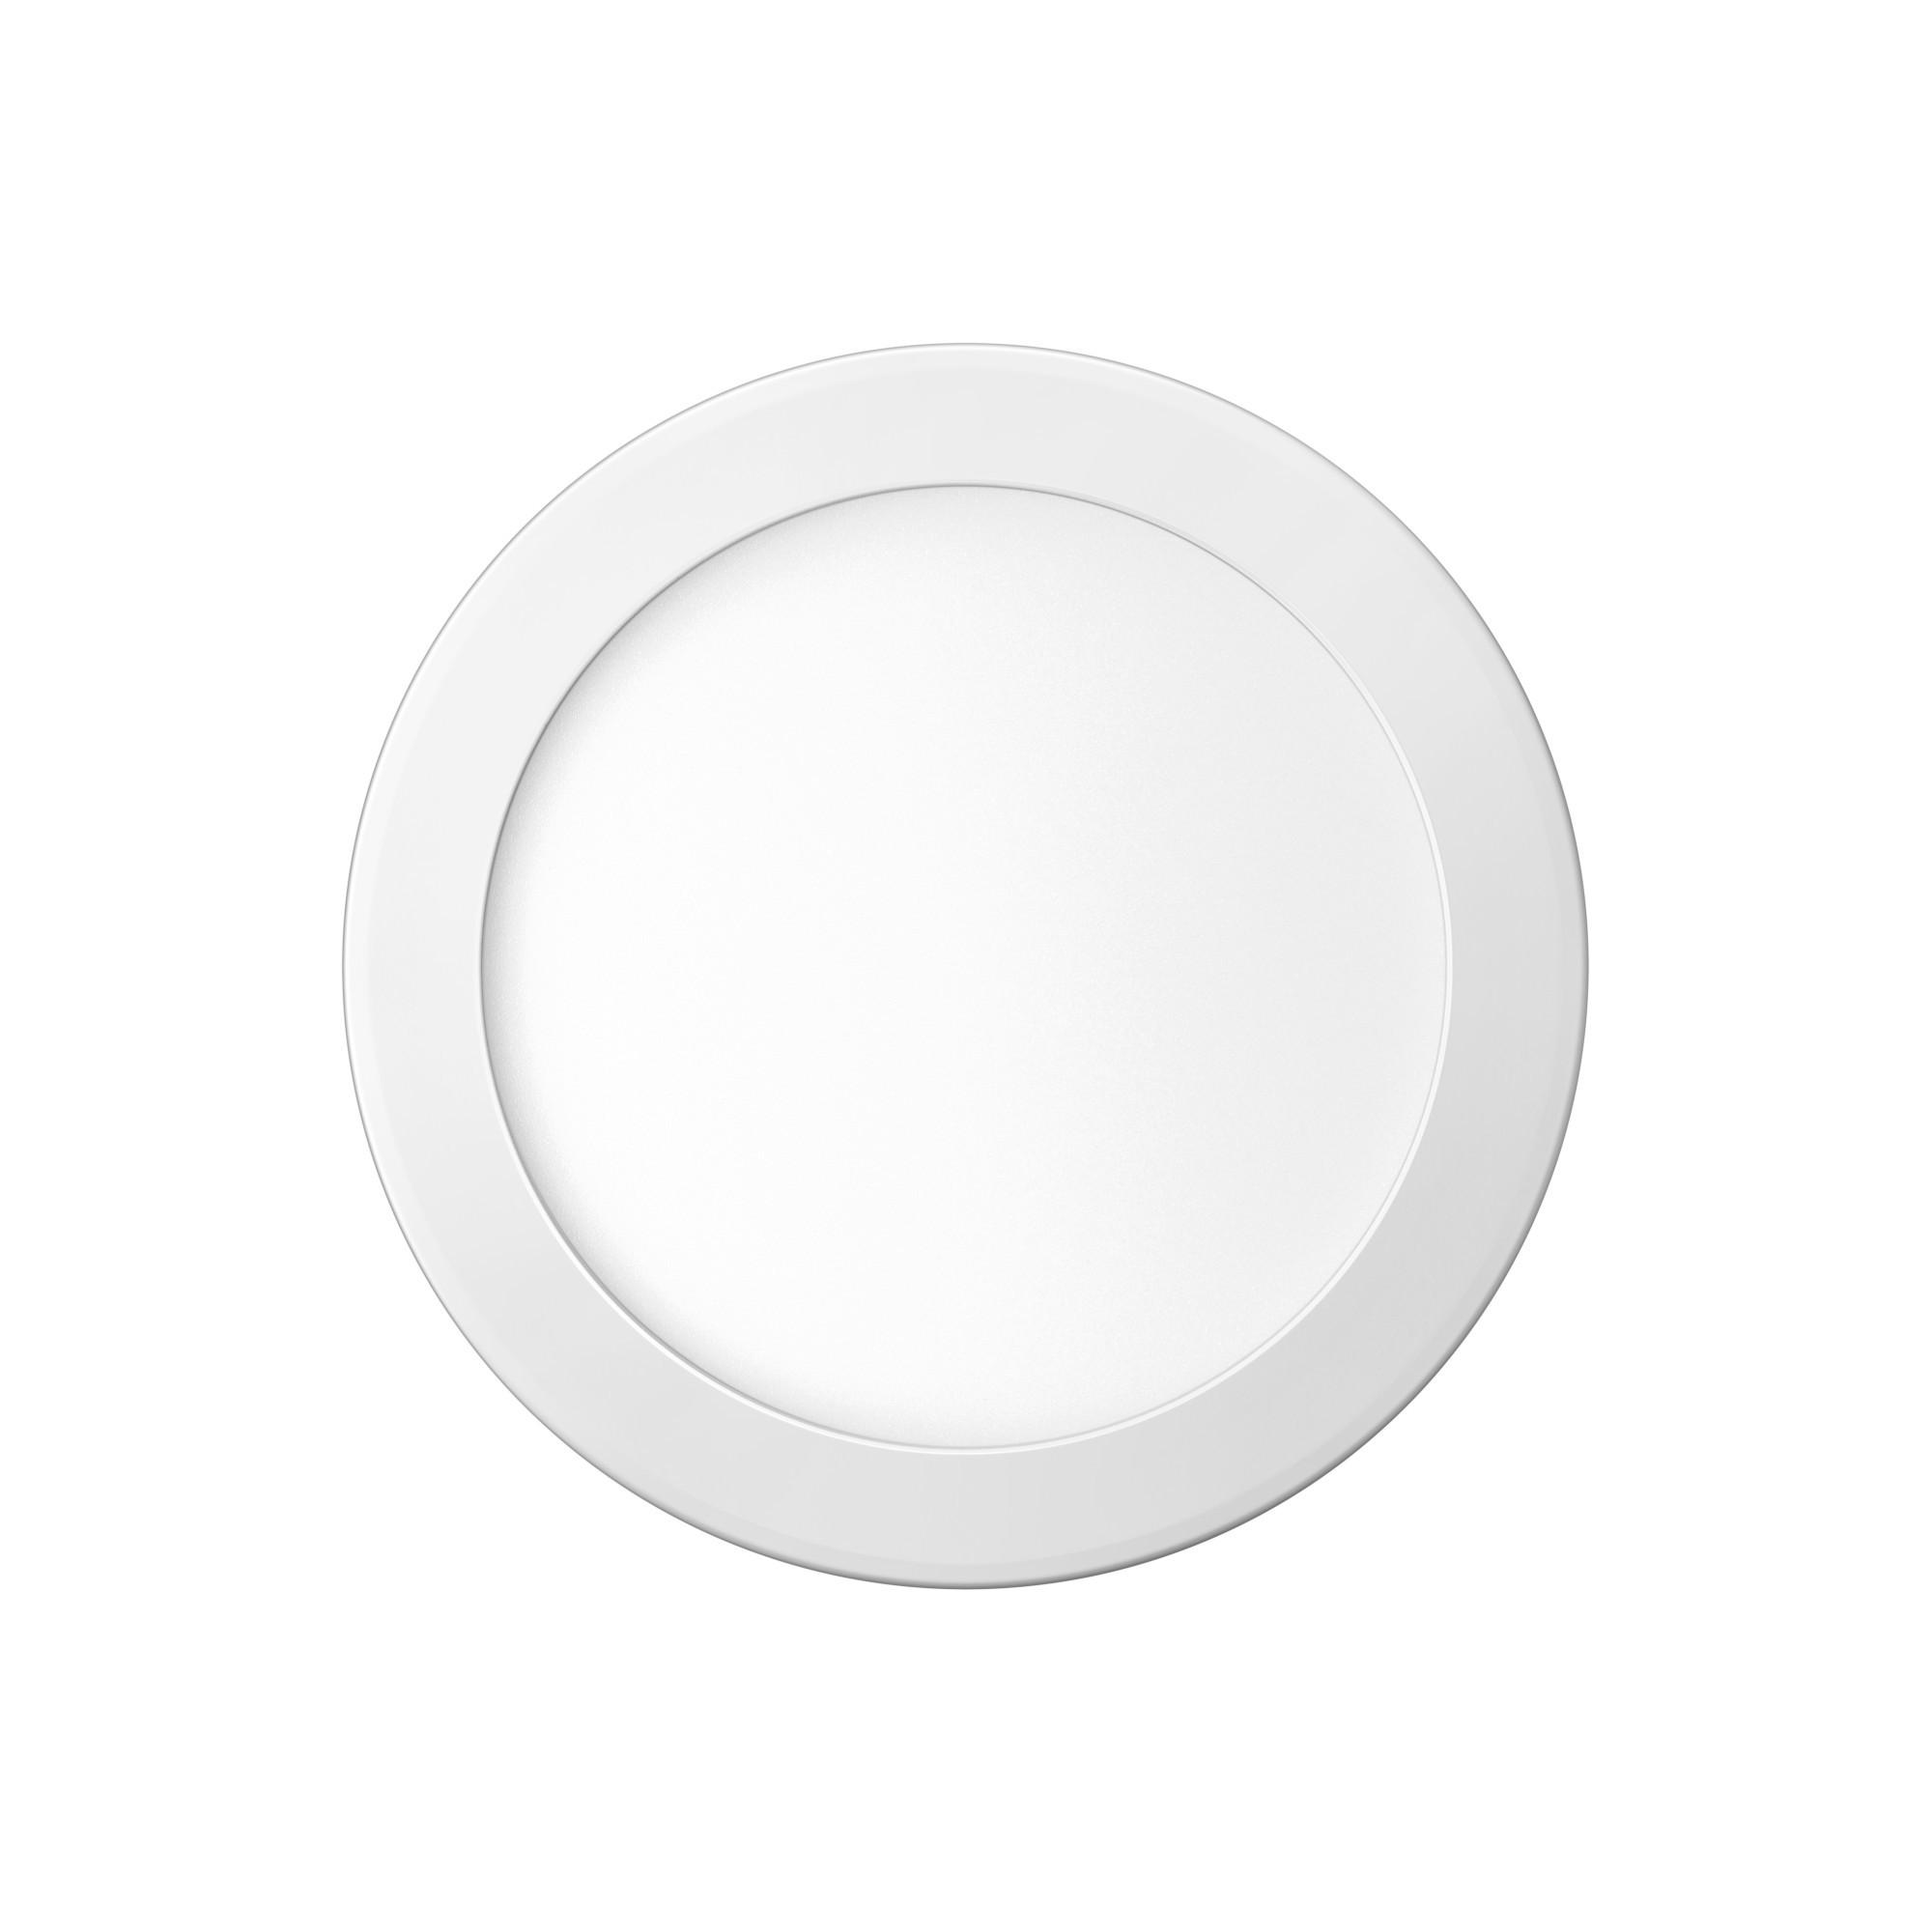 Painel LED Embutir 18W Redondo Luz Branca - Elgin